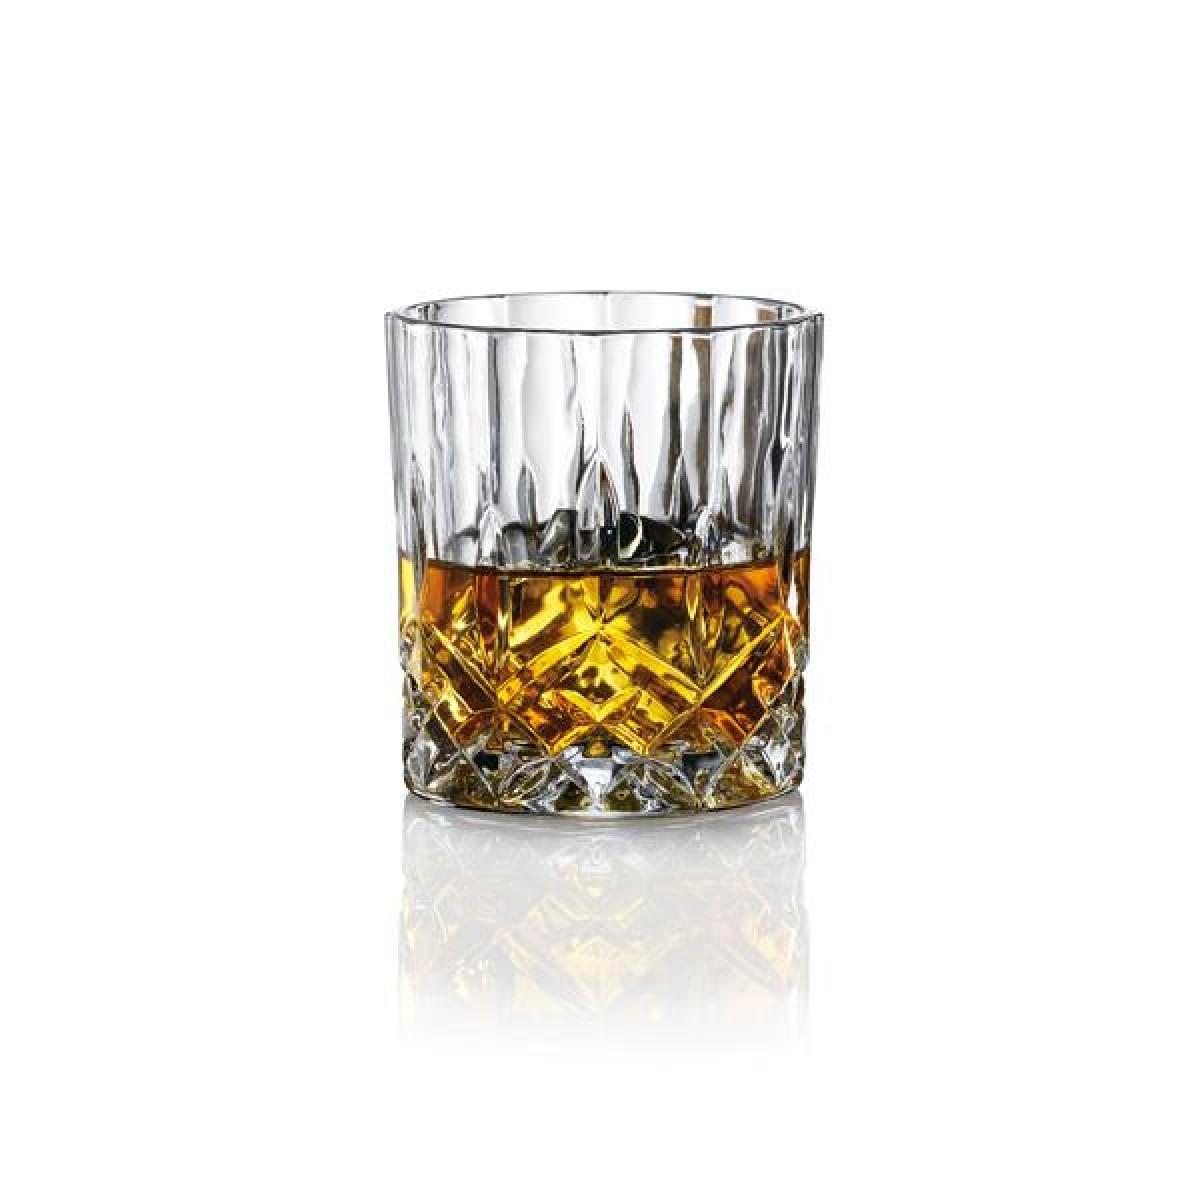 AIDA Harvey whiskey glas 4 stk. 31 cl.